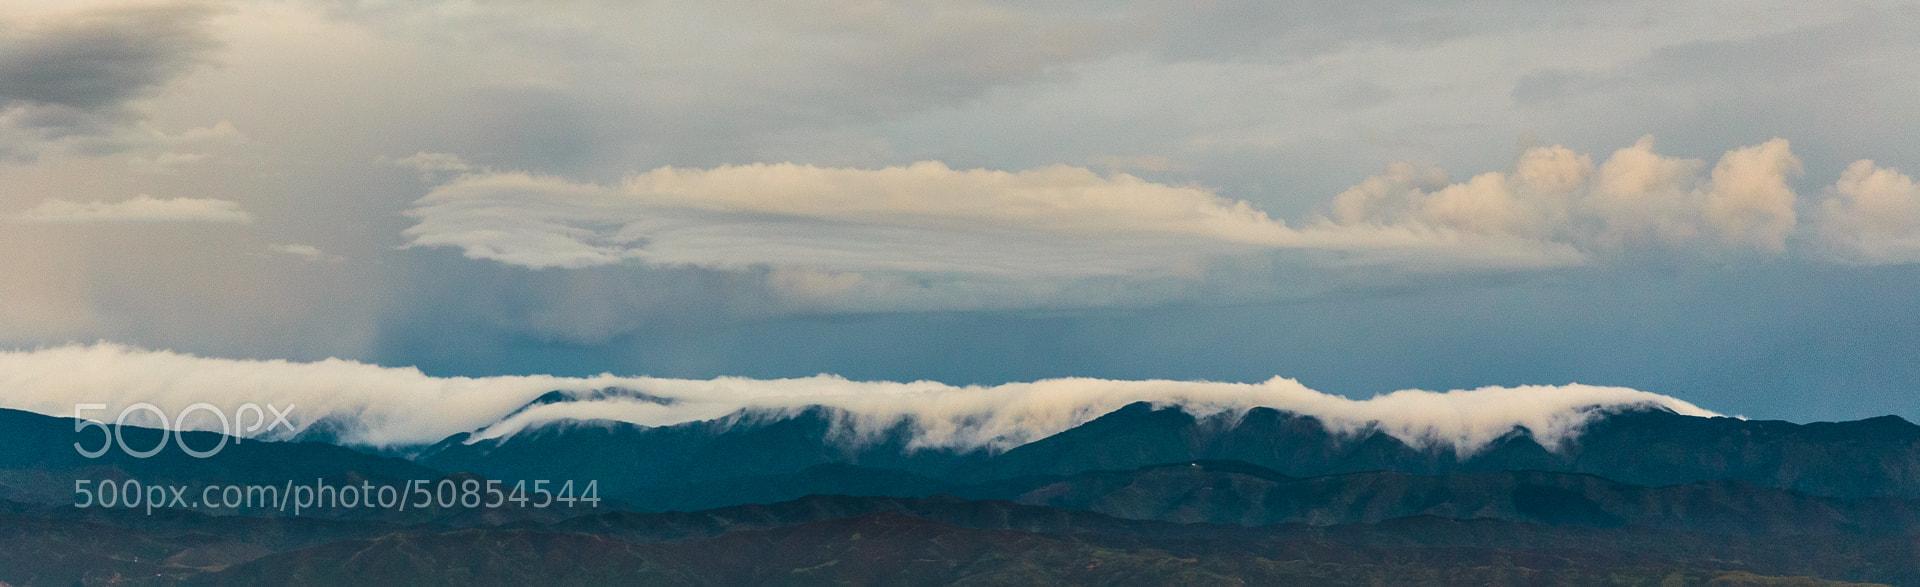 Photograph Misty hills by Adriel Kloppenburg on 500px